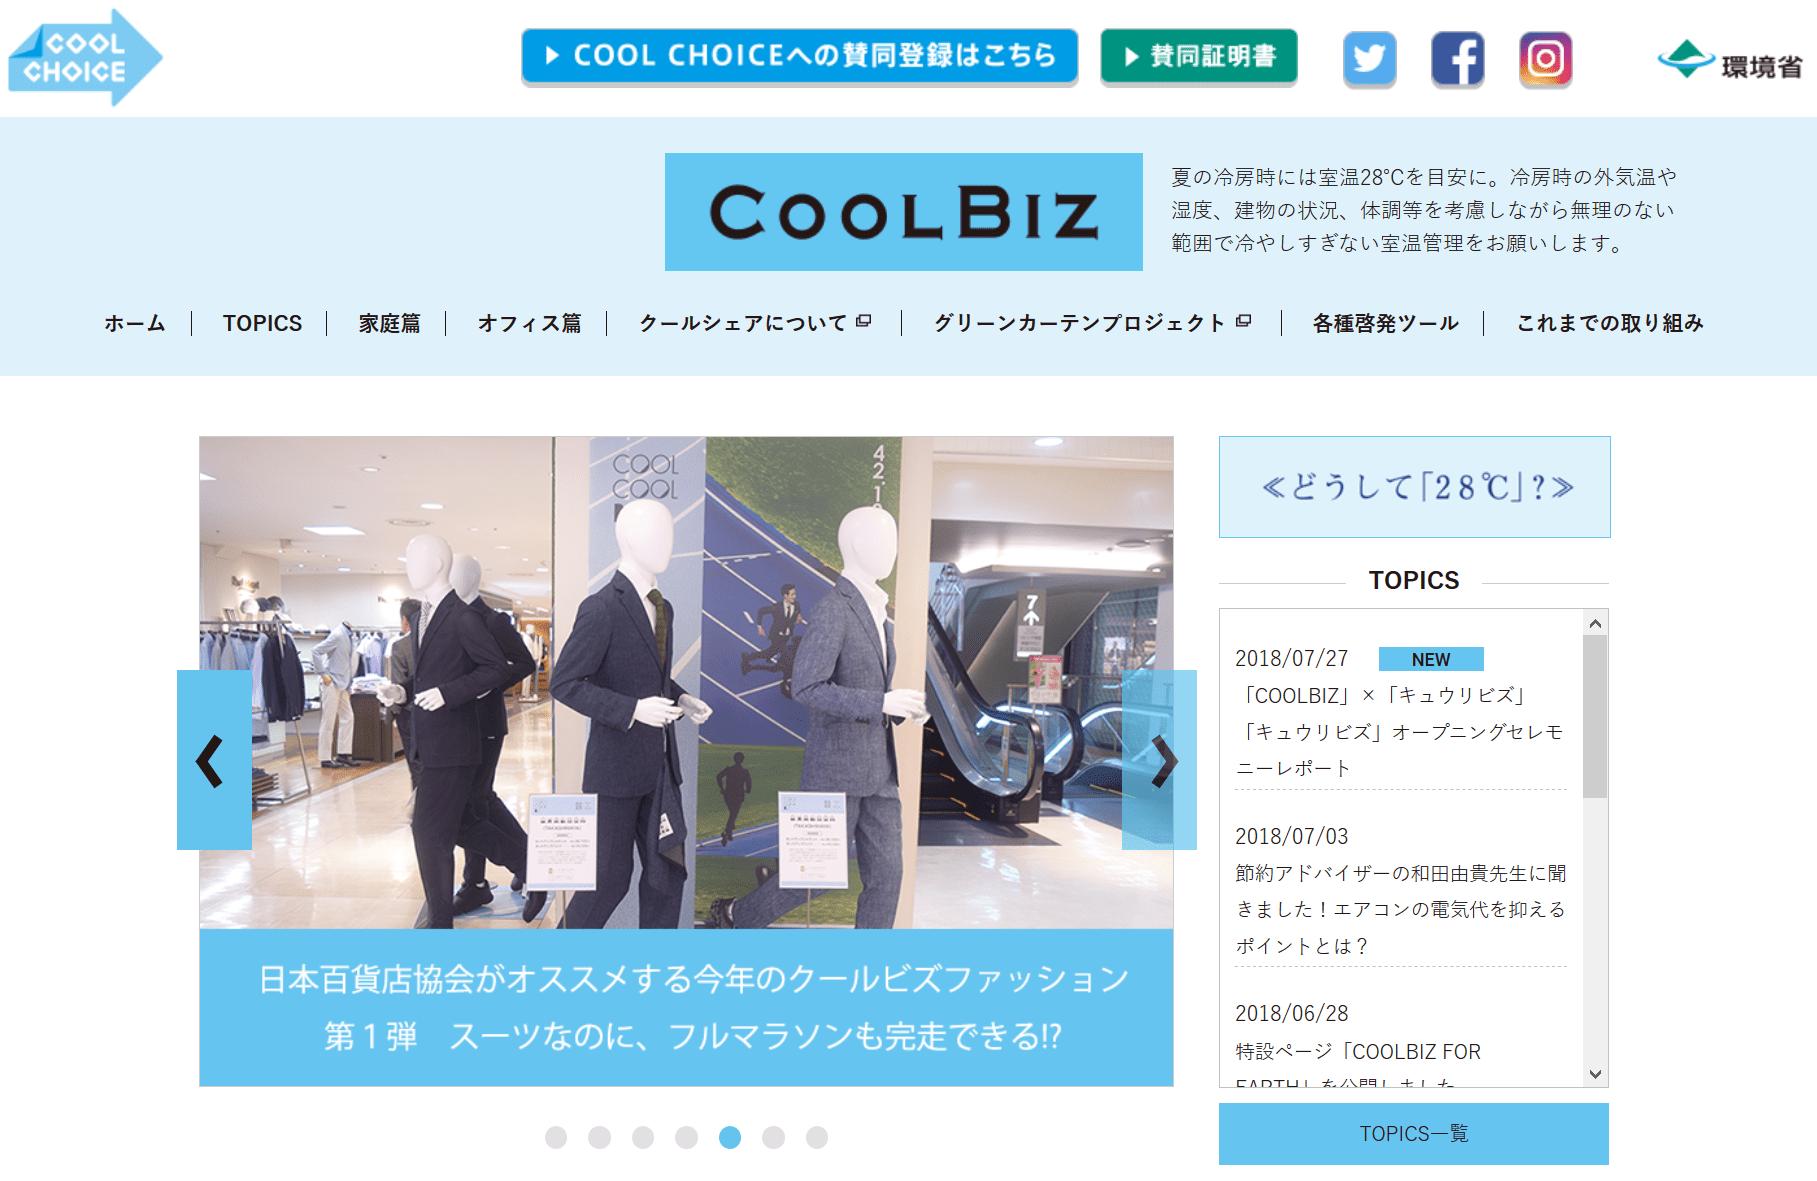 COOL BIZ クールビズ